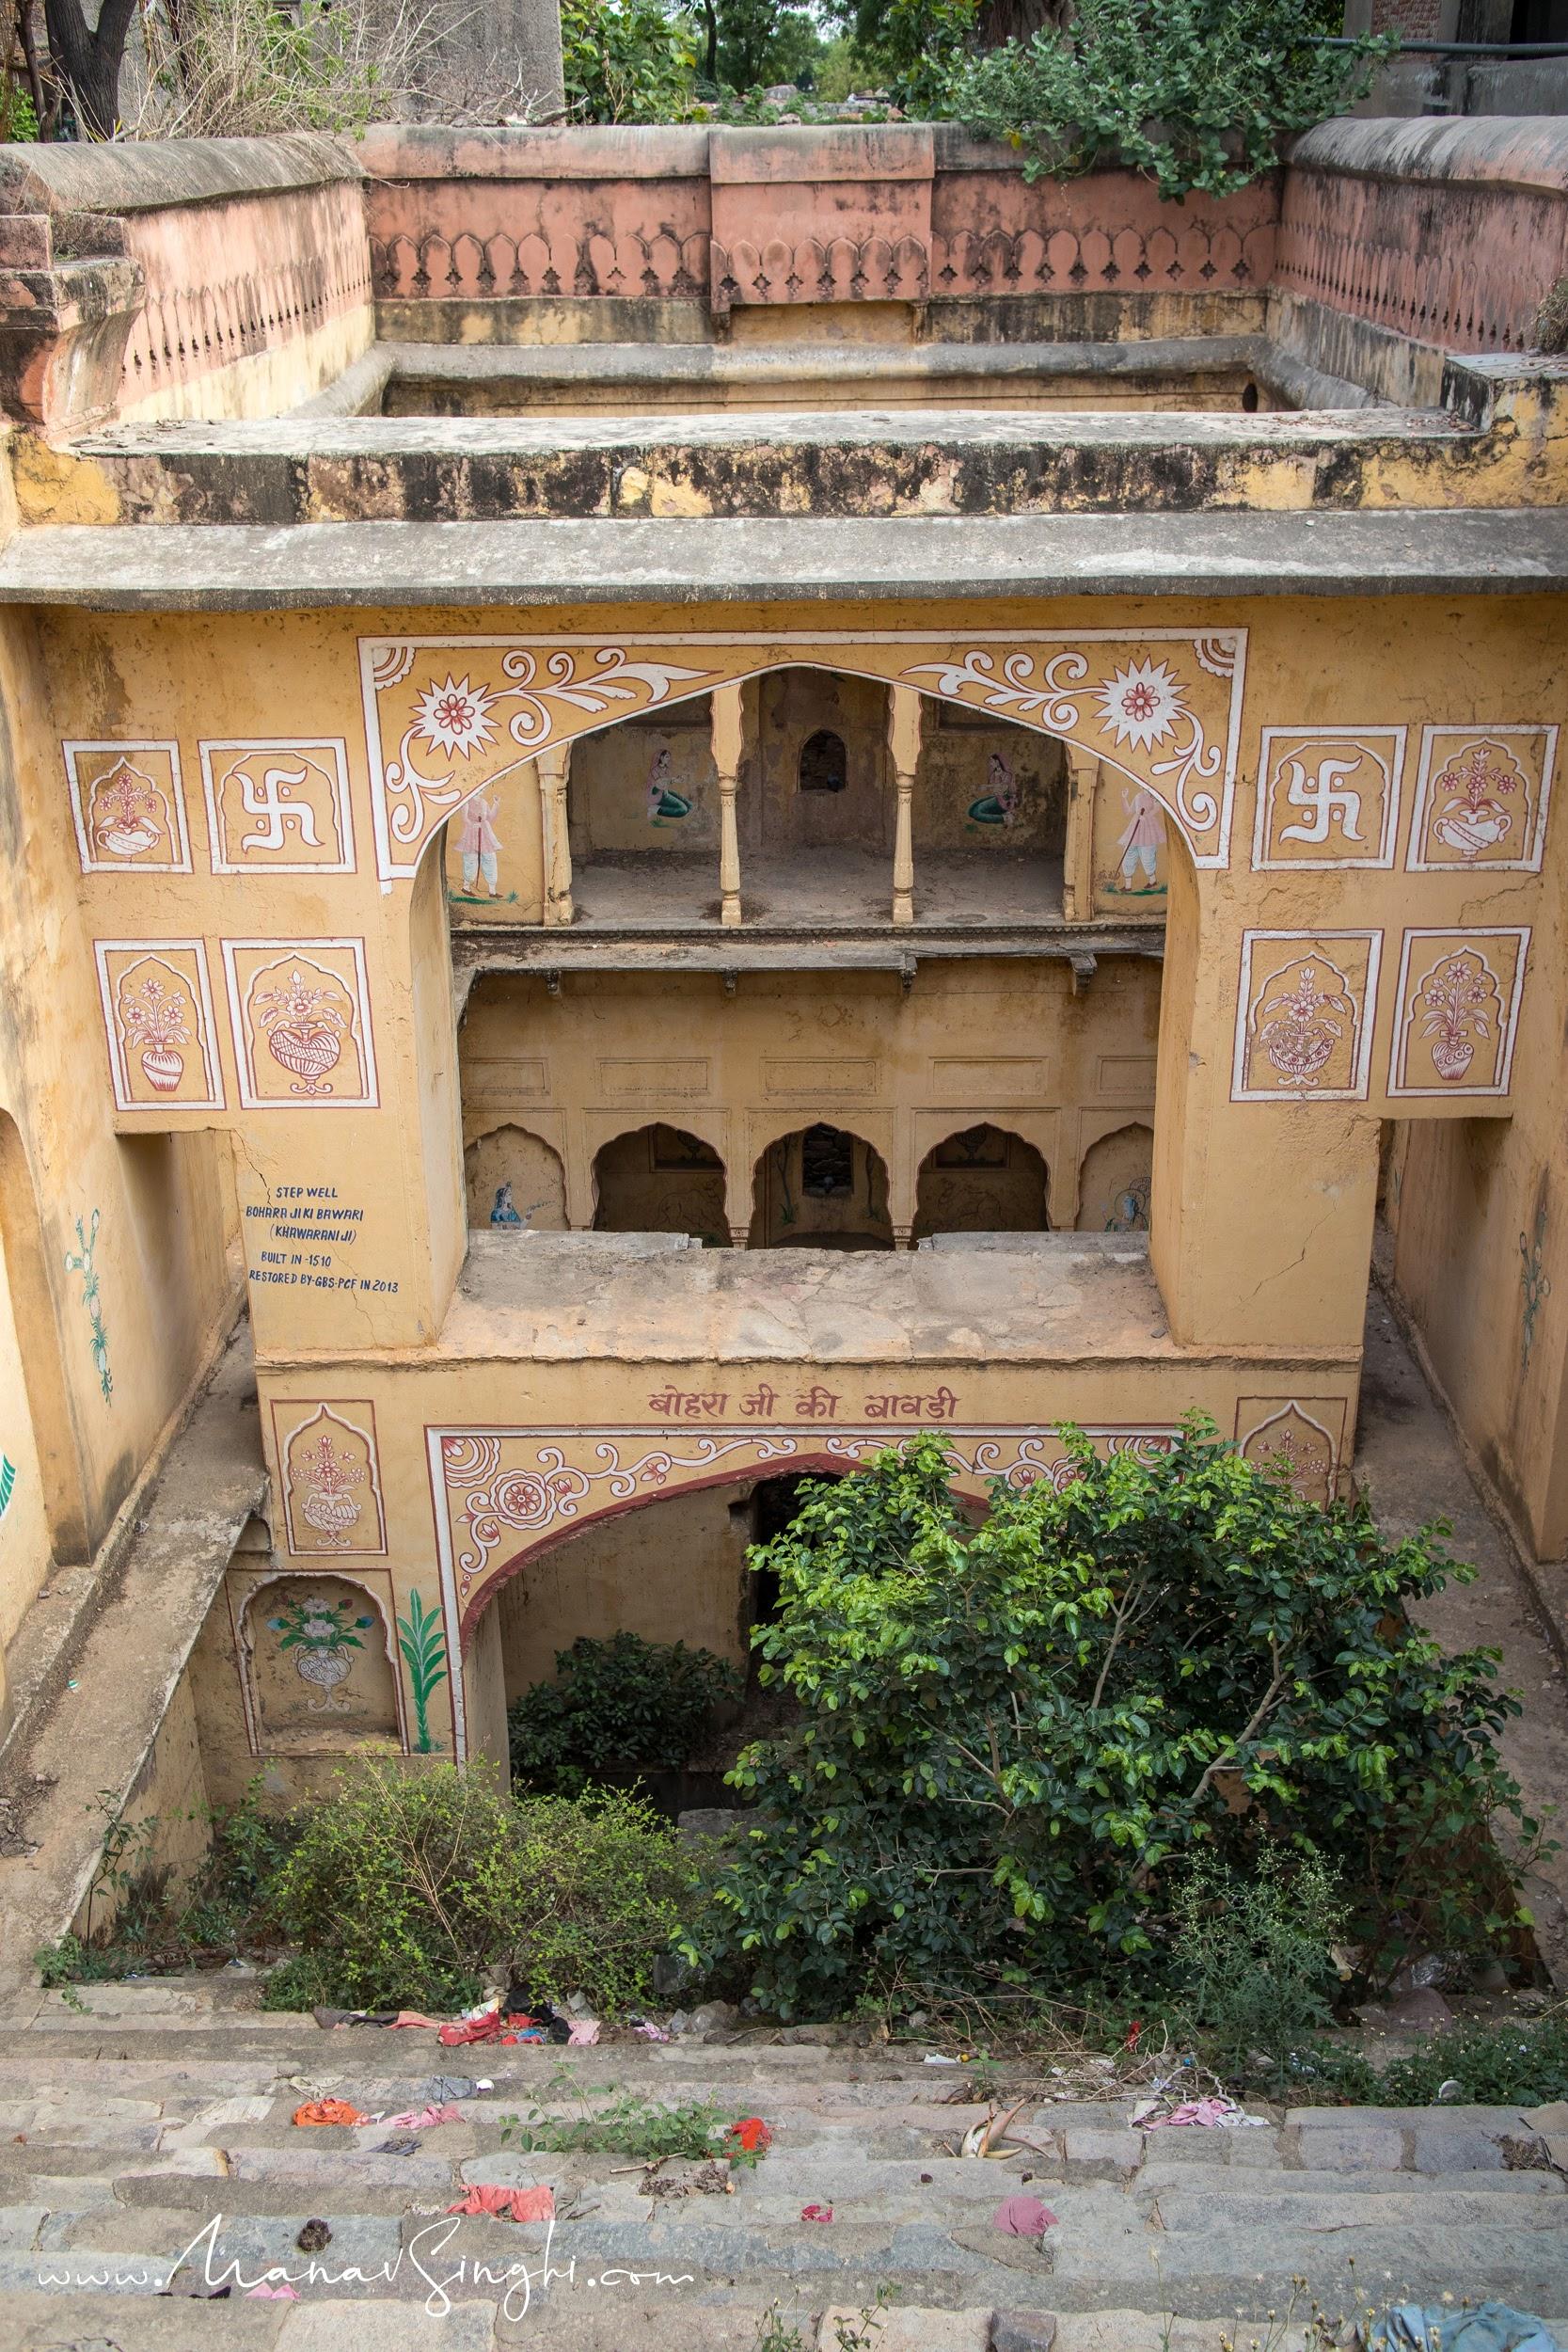 Shot Taken on 3-June-2021 BoharaJi Ki Bawari StepWell - KhawaraniJi, Jaipur.